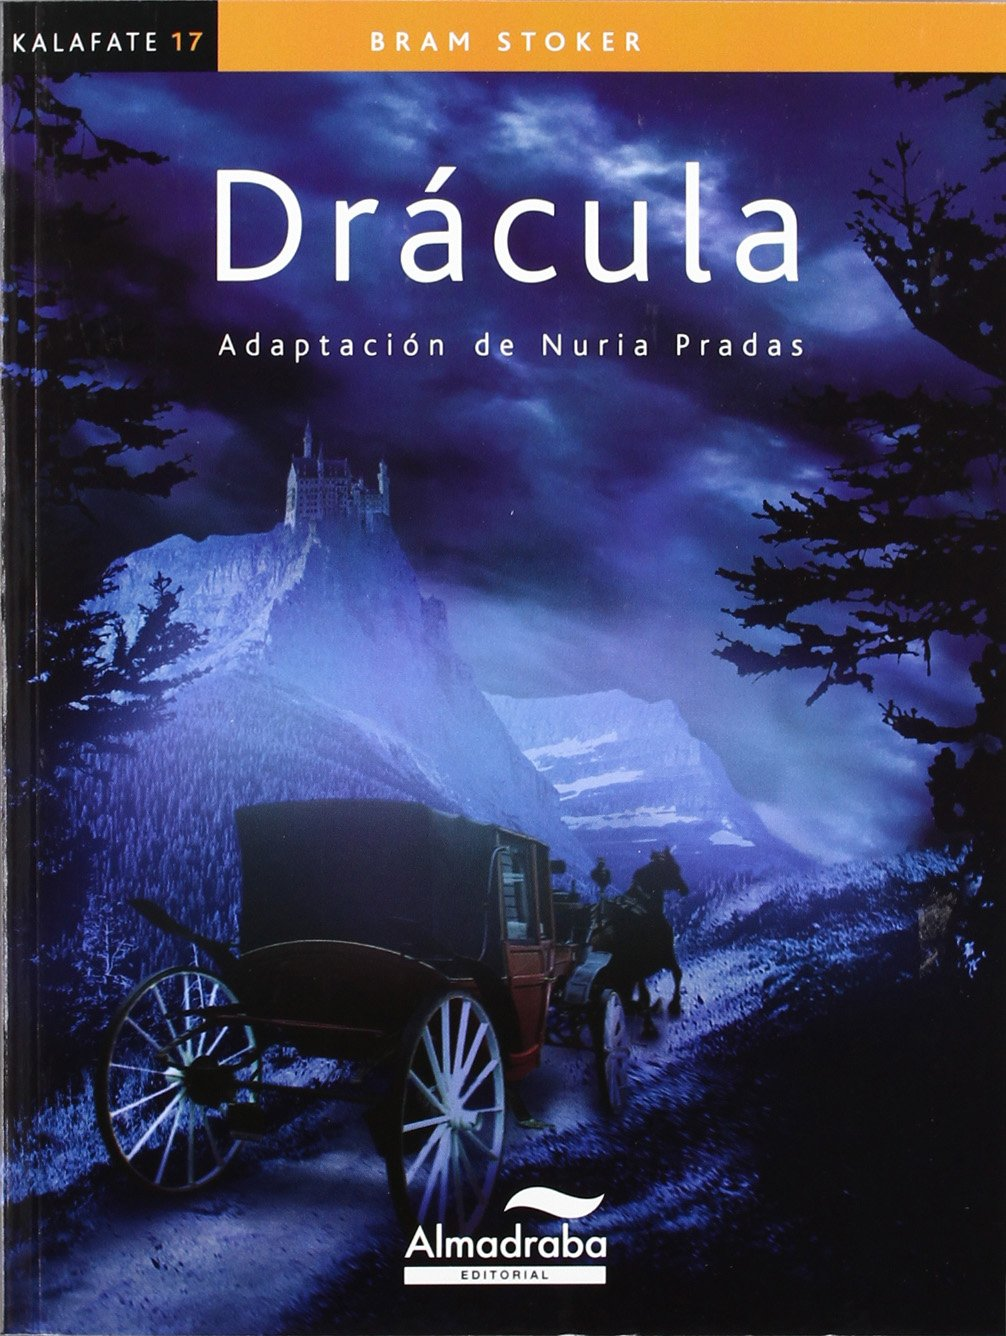 Drácula (kalafate) (Colección Kalafate): Amazon.es: Stoker, Bram, Danide, Pradas, Núria: Libros